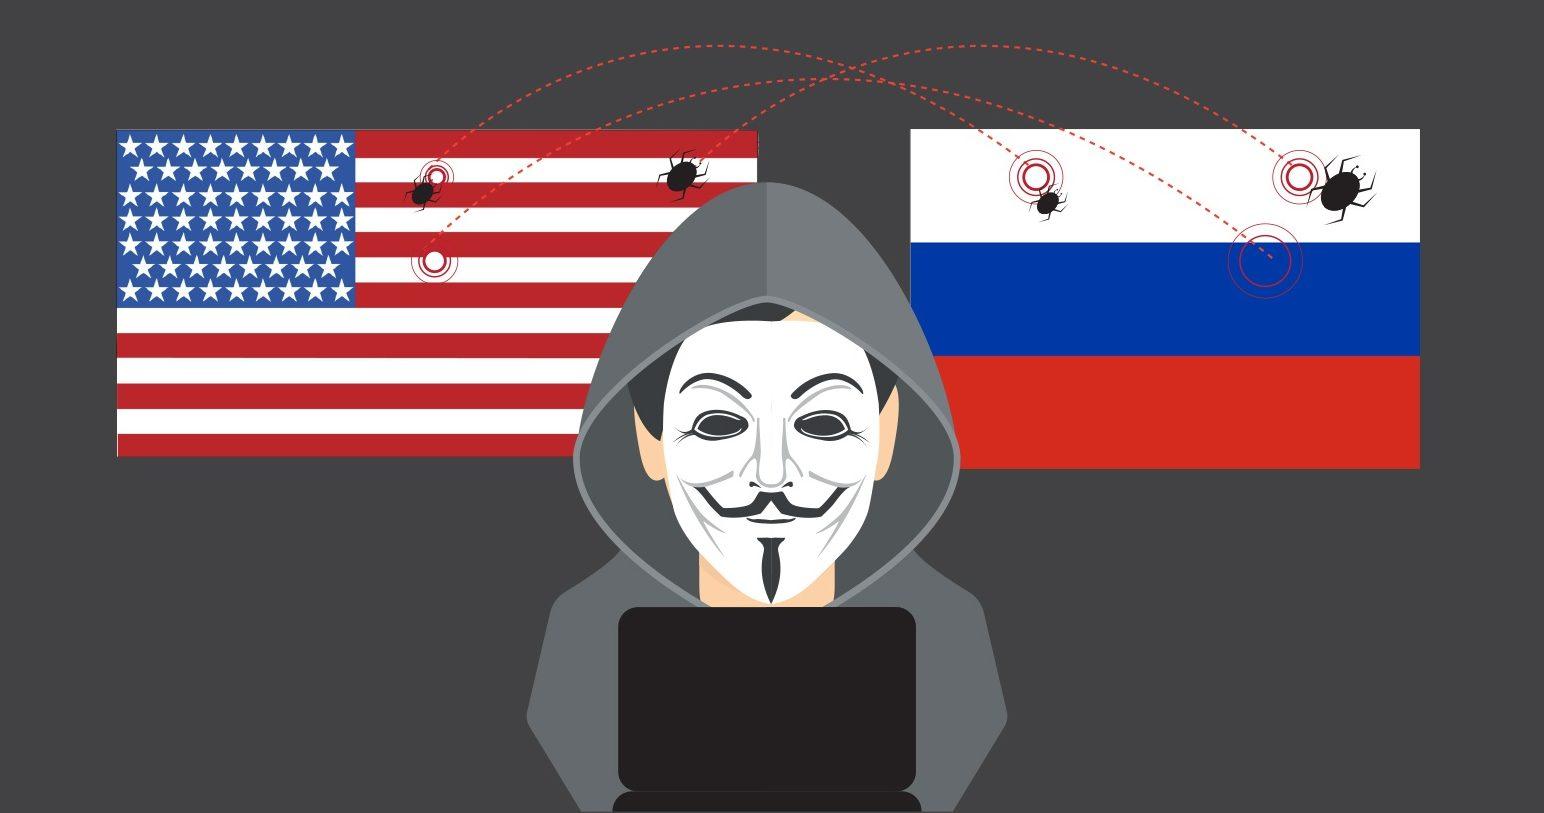 Cyberwar-US-Russia